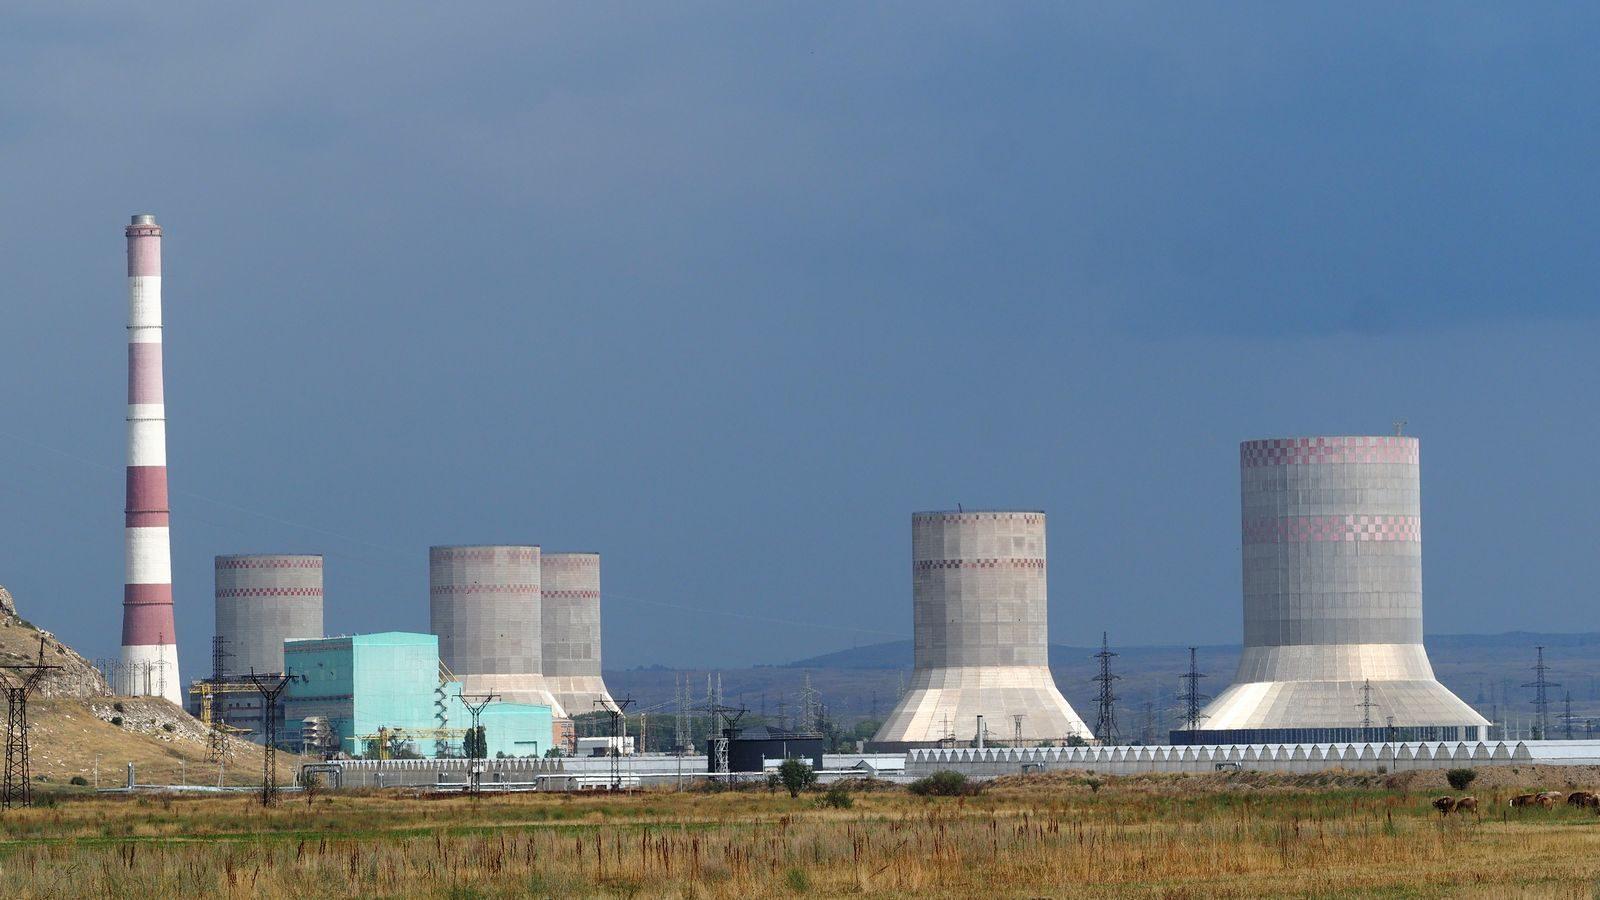 Radreise Armenien - Hrazdan Thermal Power Plant